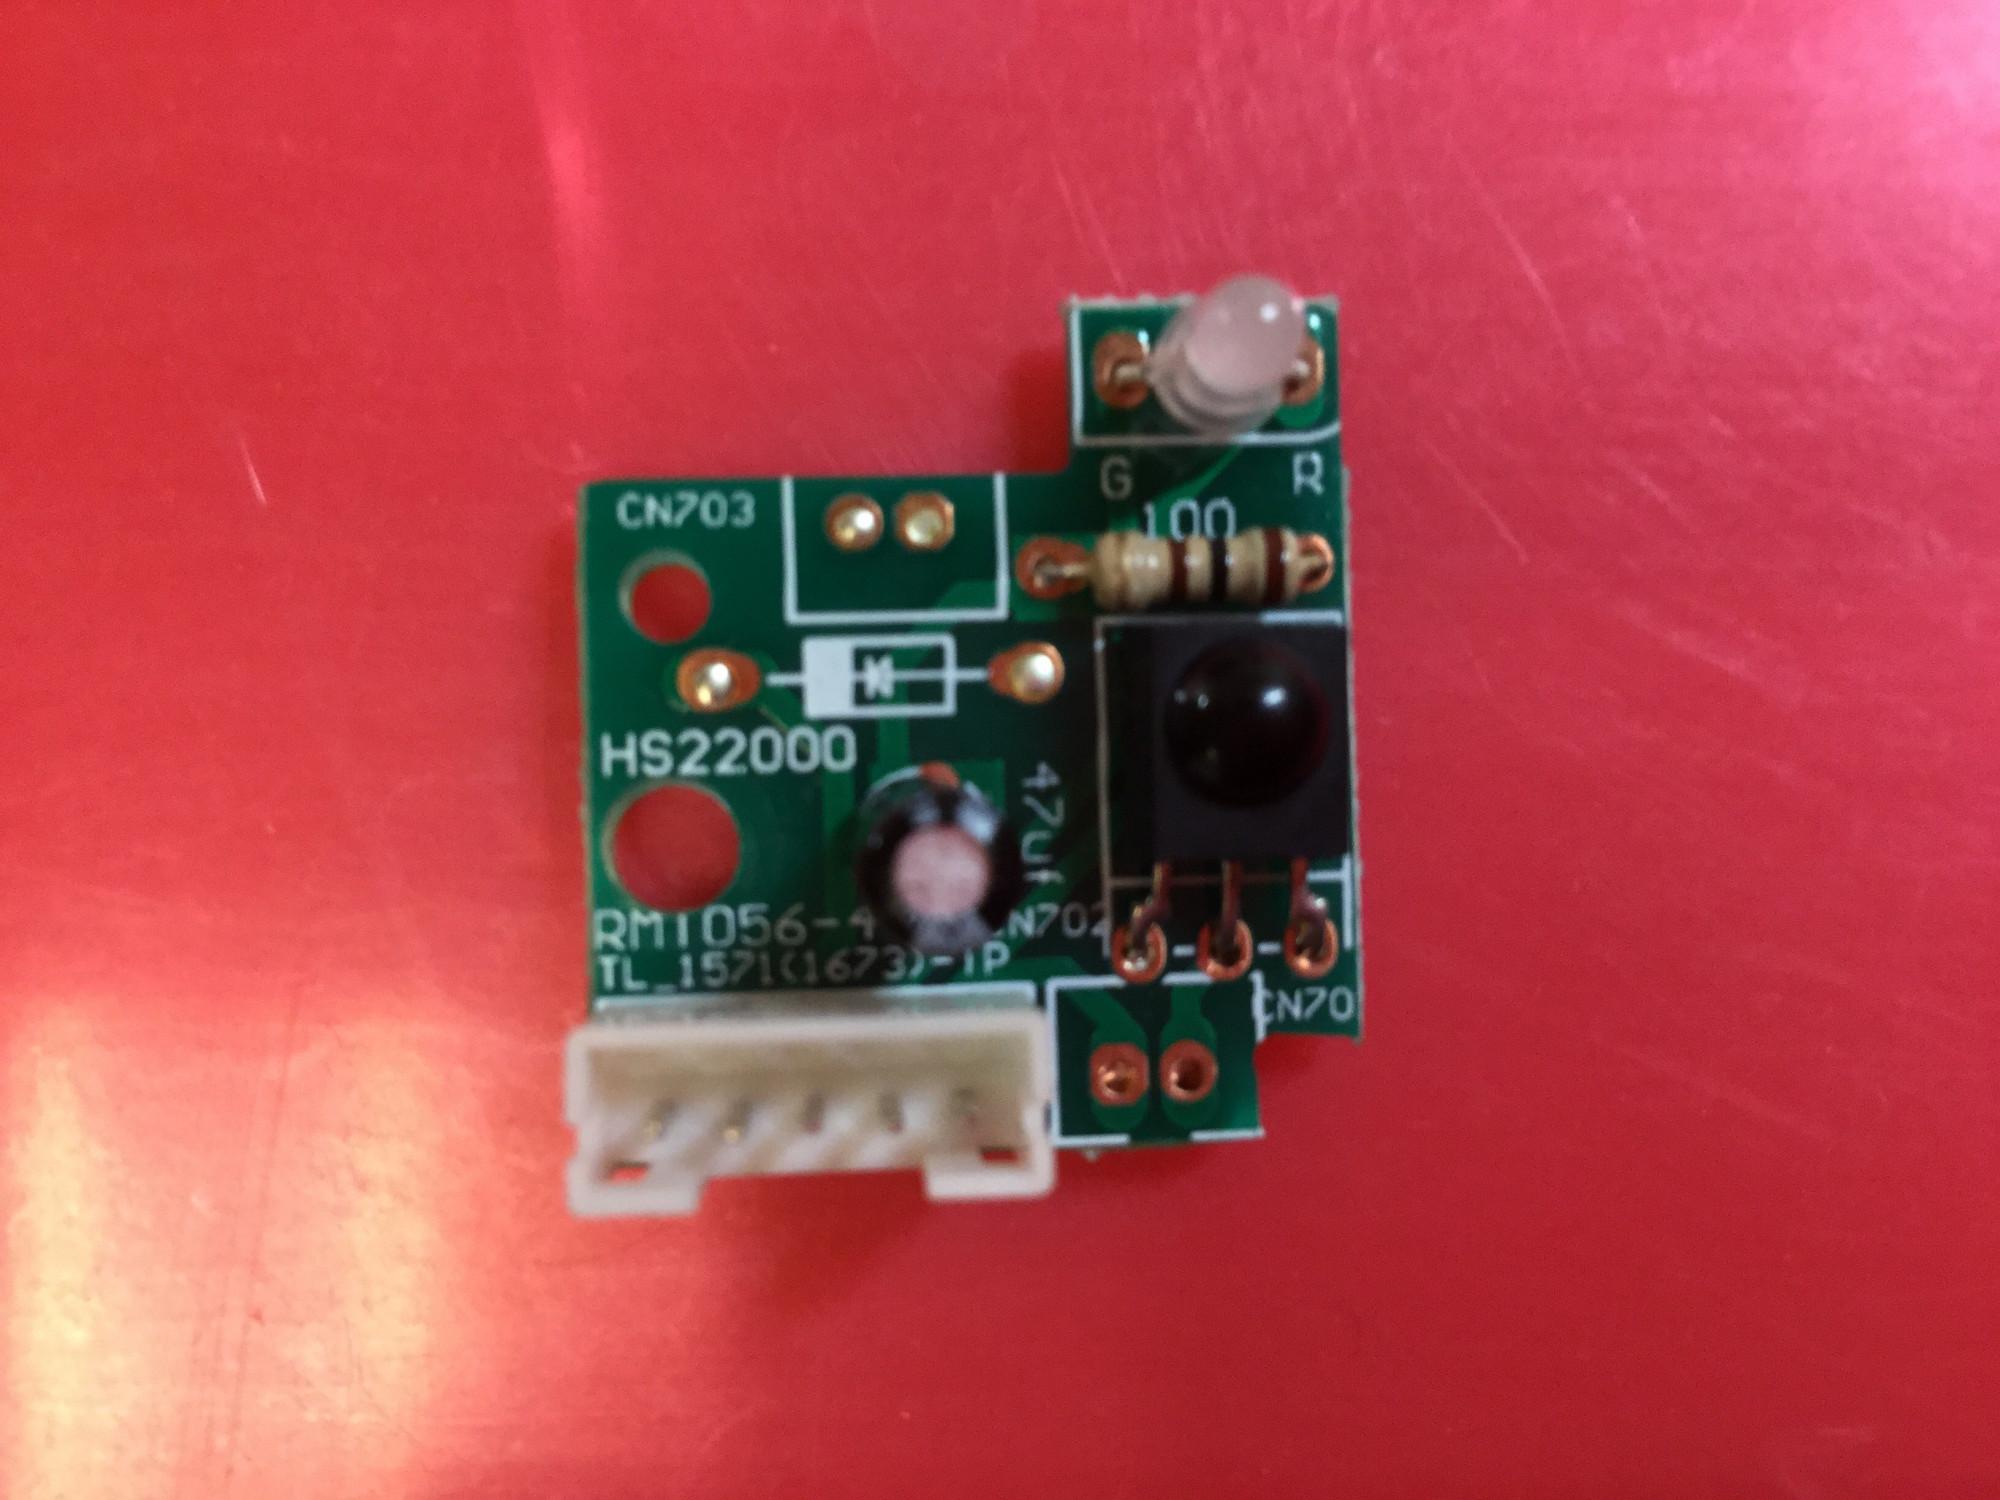 Rmt056 4 Ir Remote Control Sensor For Marks Amp Spencer Ms32100dvb Checking Led